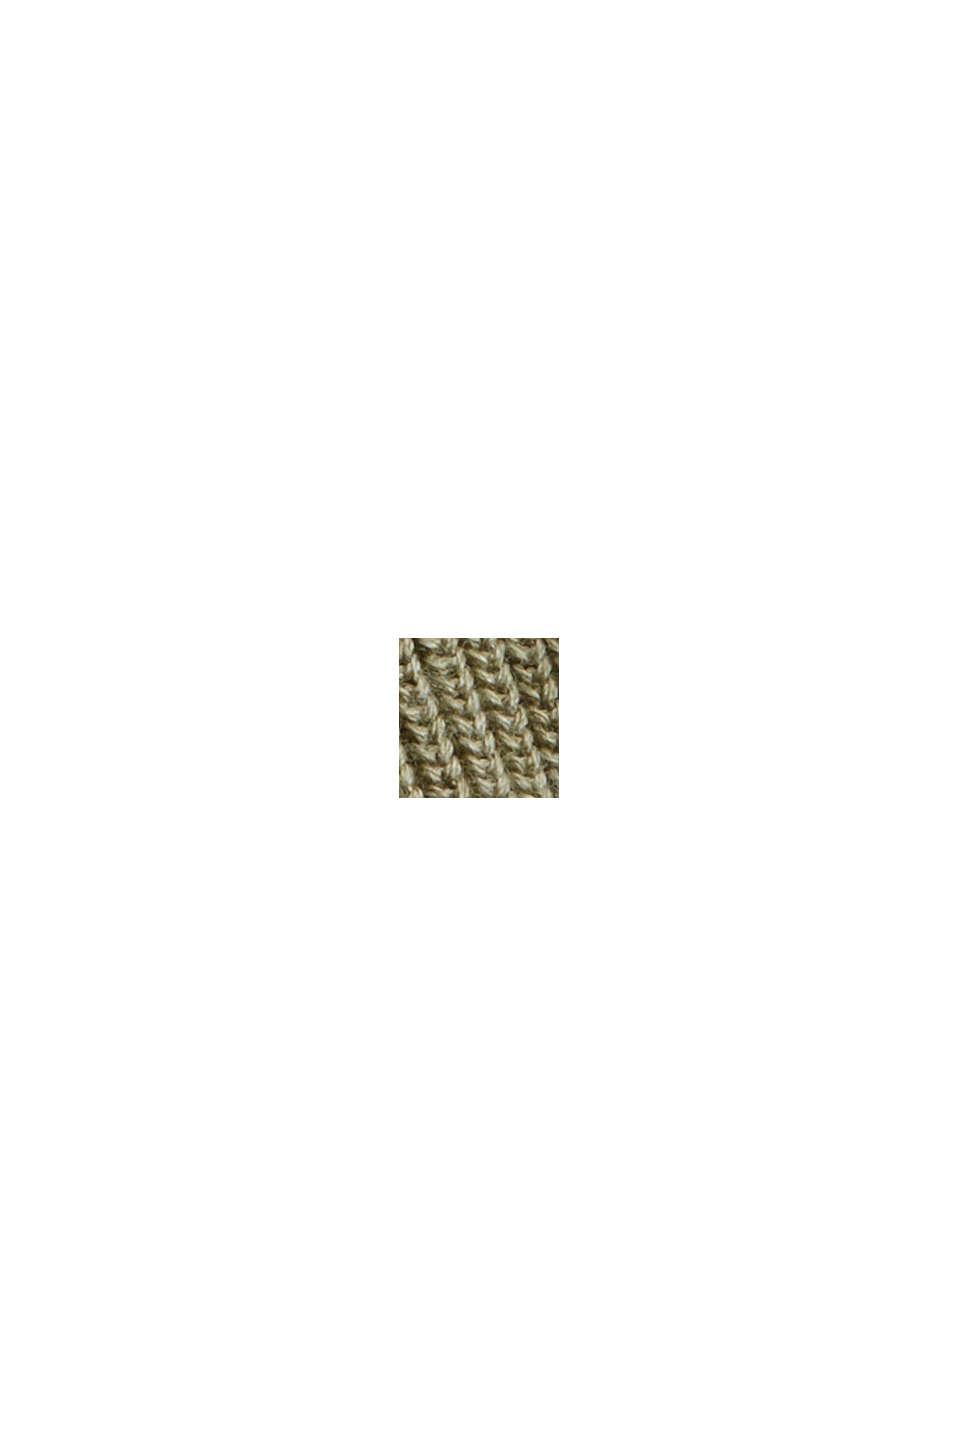 Pullover dolcevita in 100% cotone biologico, PALE KHAKI, swatch